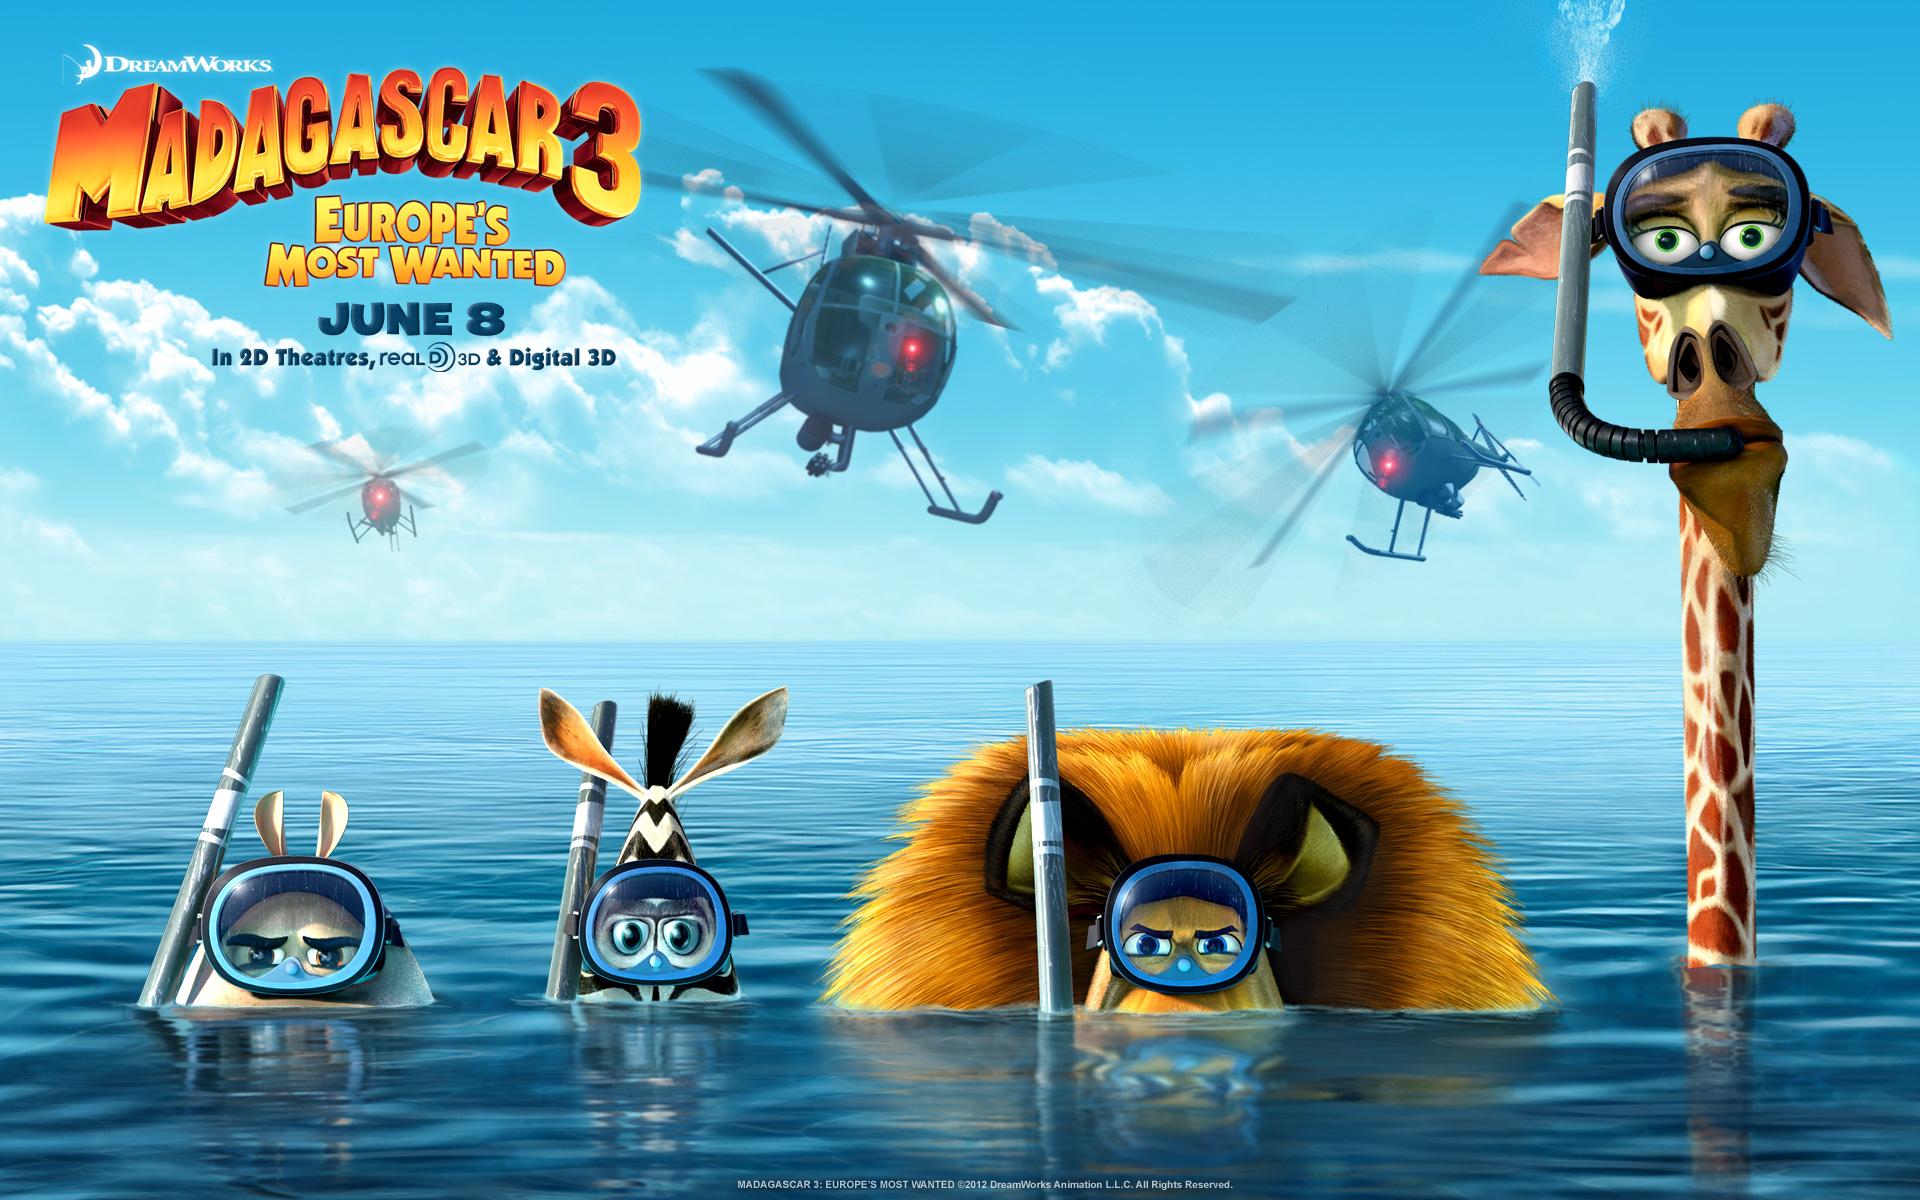 Gambar Madagascar